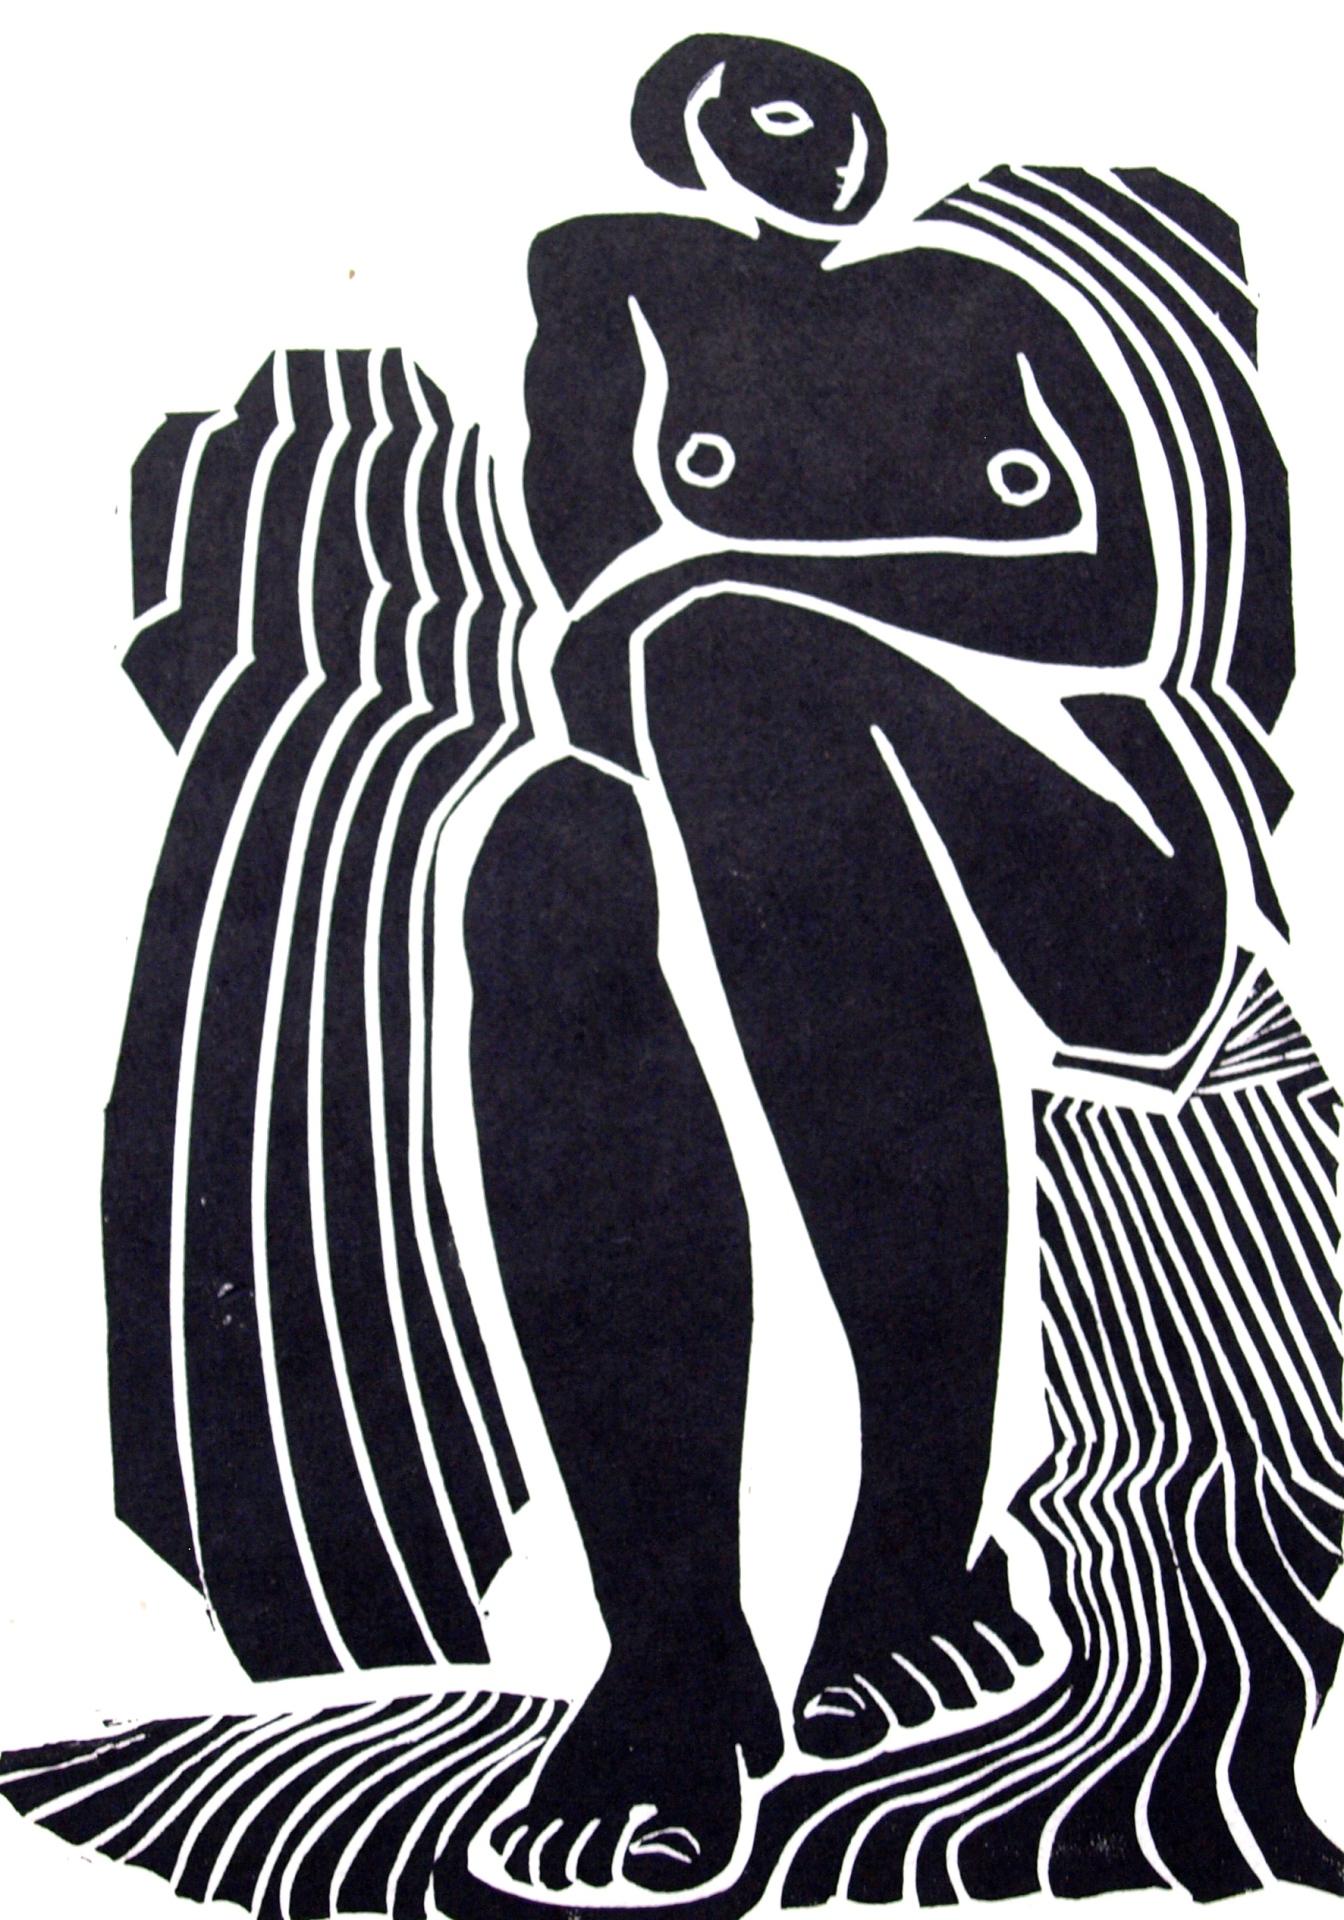 Original Linocut: Seated nude on striped blanket